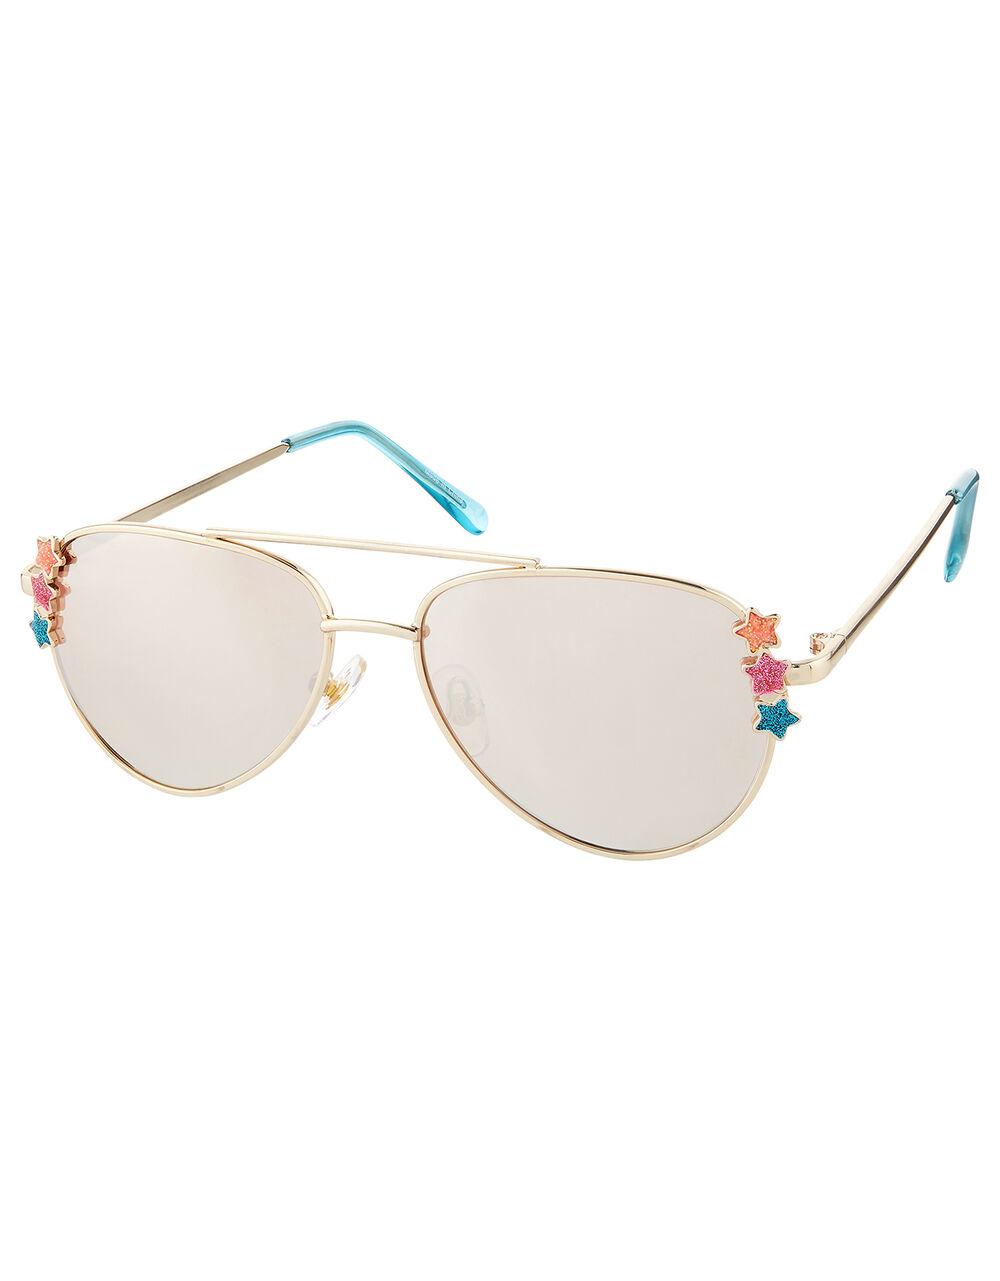 Star Aviator Sunglasses, , large